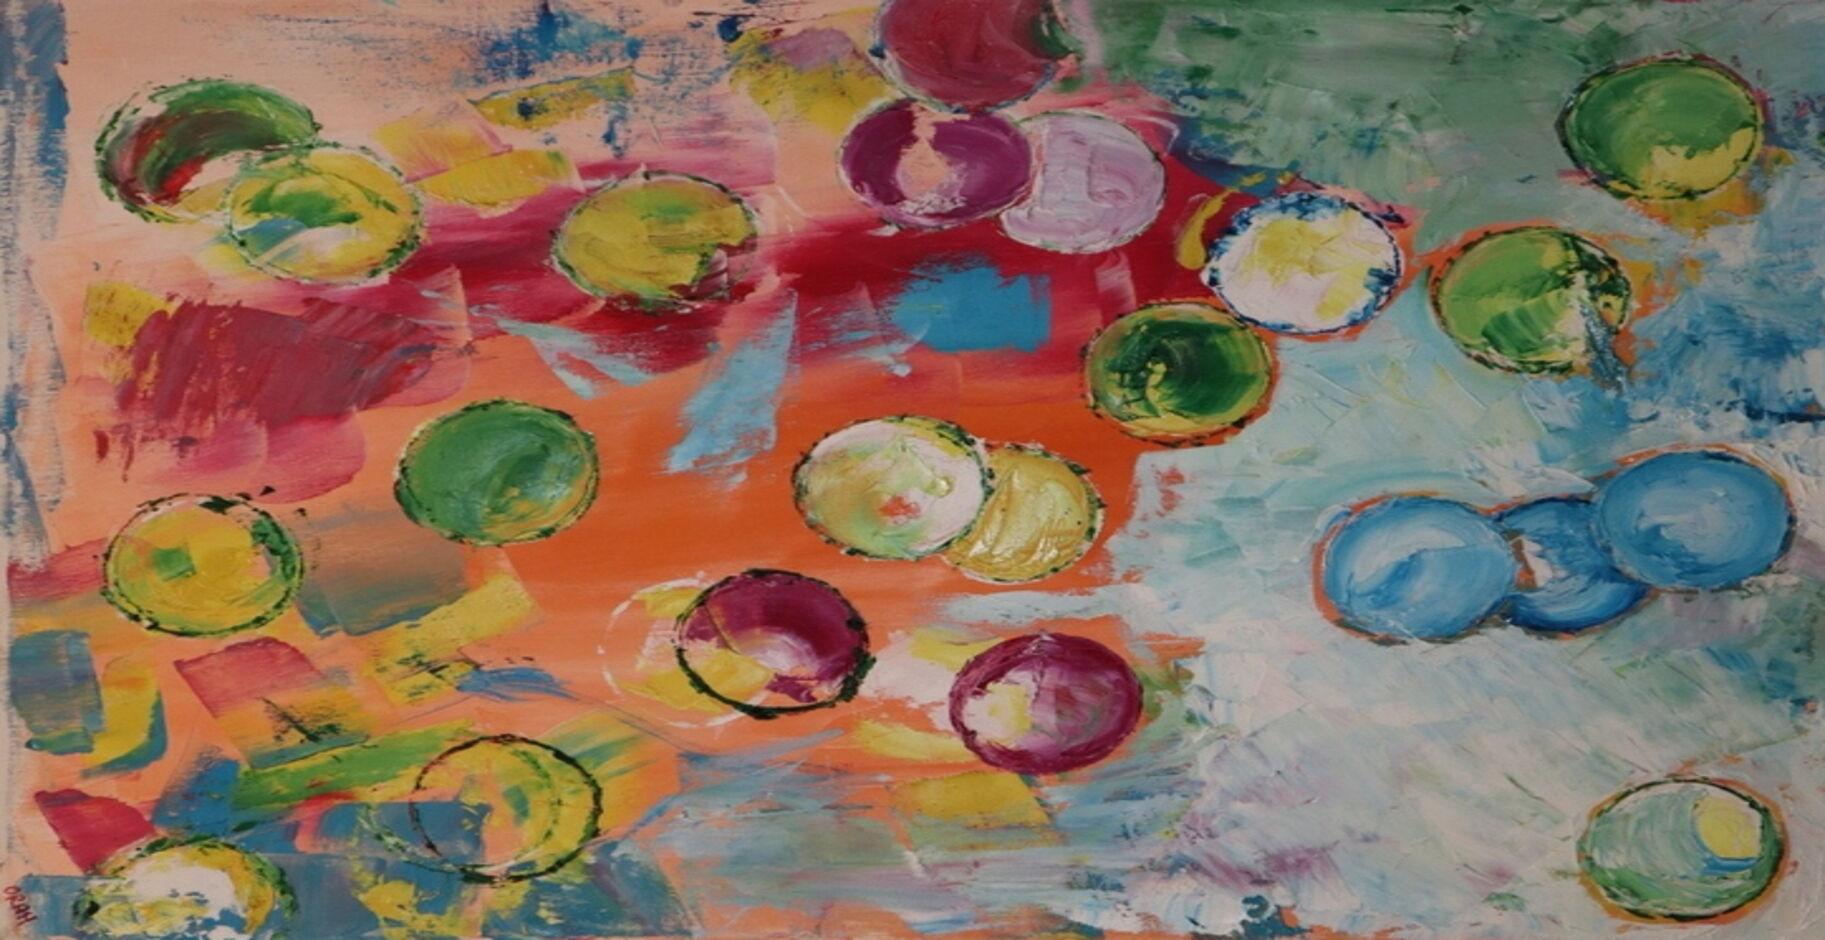 Abstract 2 oil paint ORAHART Israeli painter – Swetlana Zakharyan